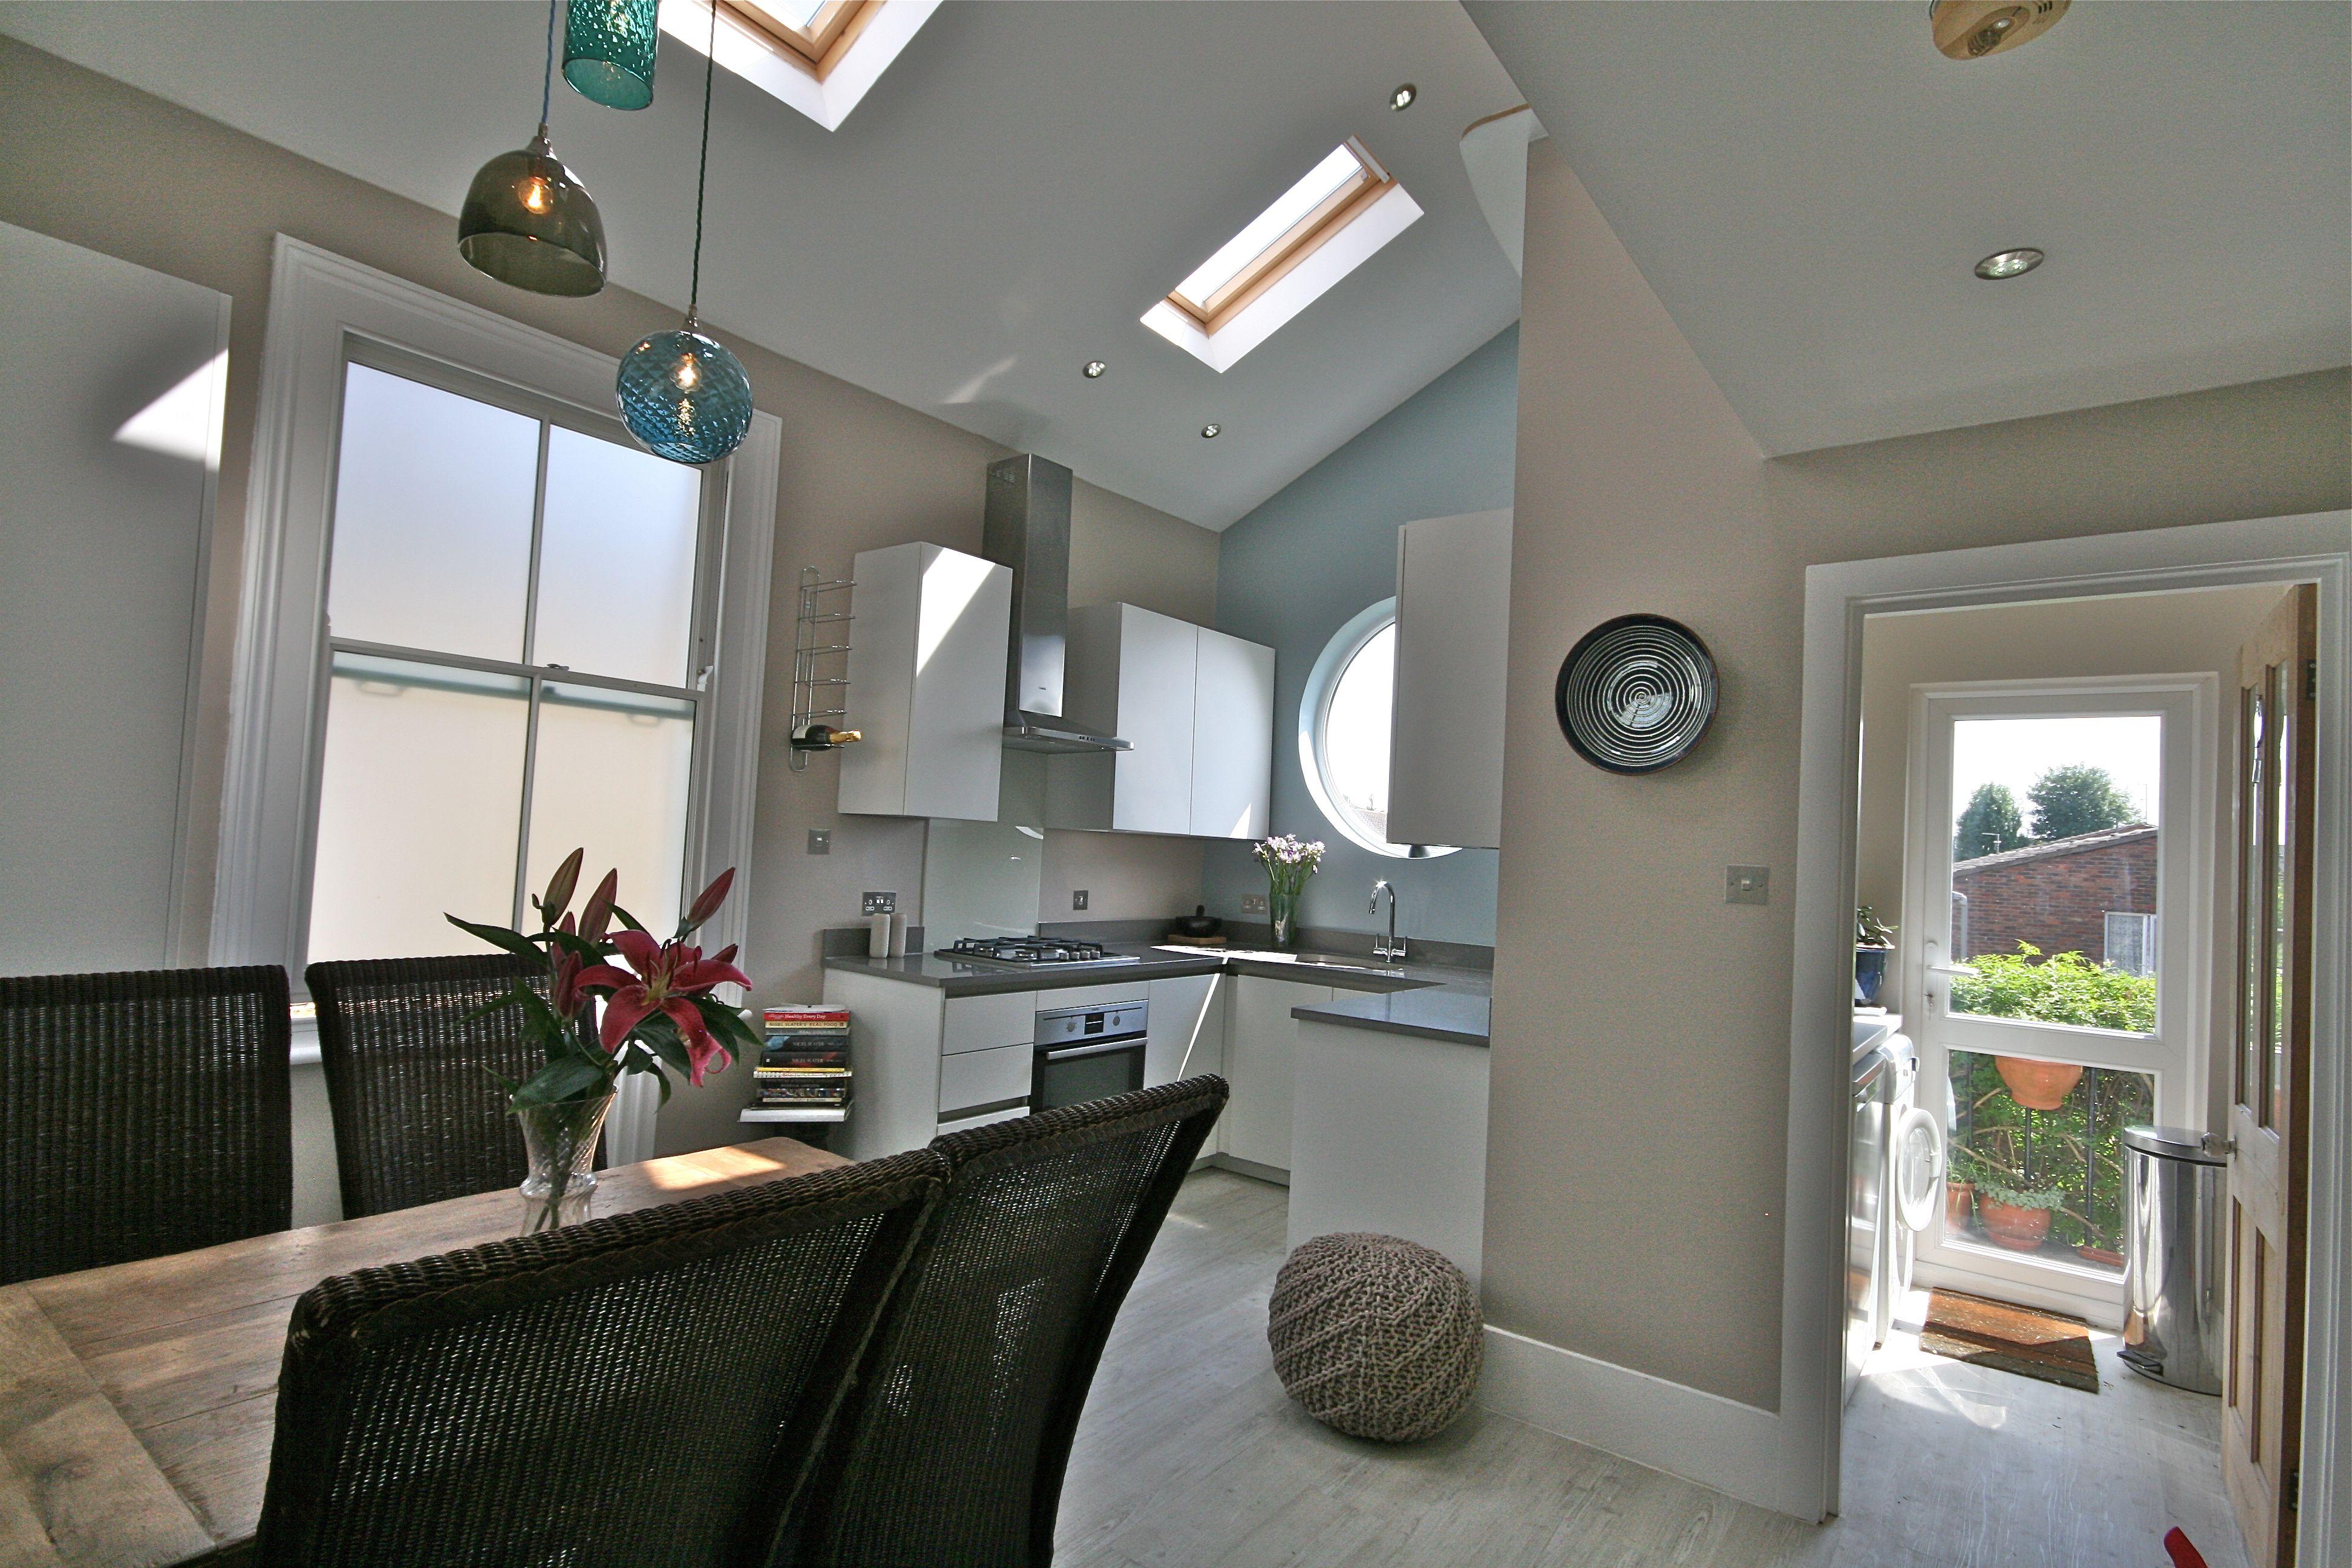 Best Kitchen Refurbishment In Balham Walls In Farrow And Ball S 640 x 480